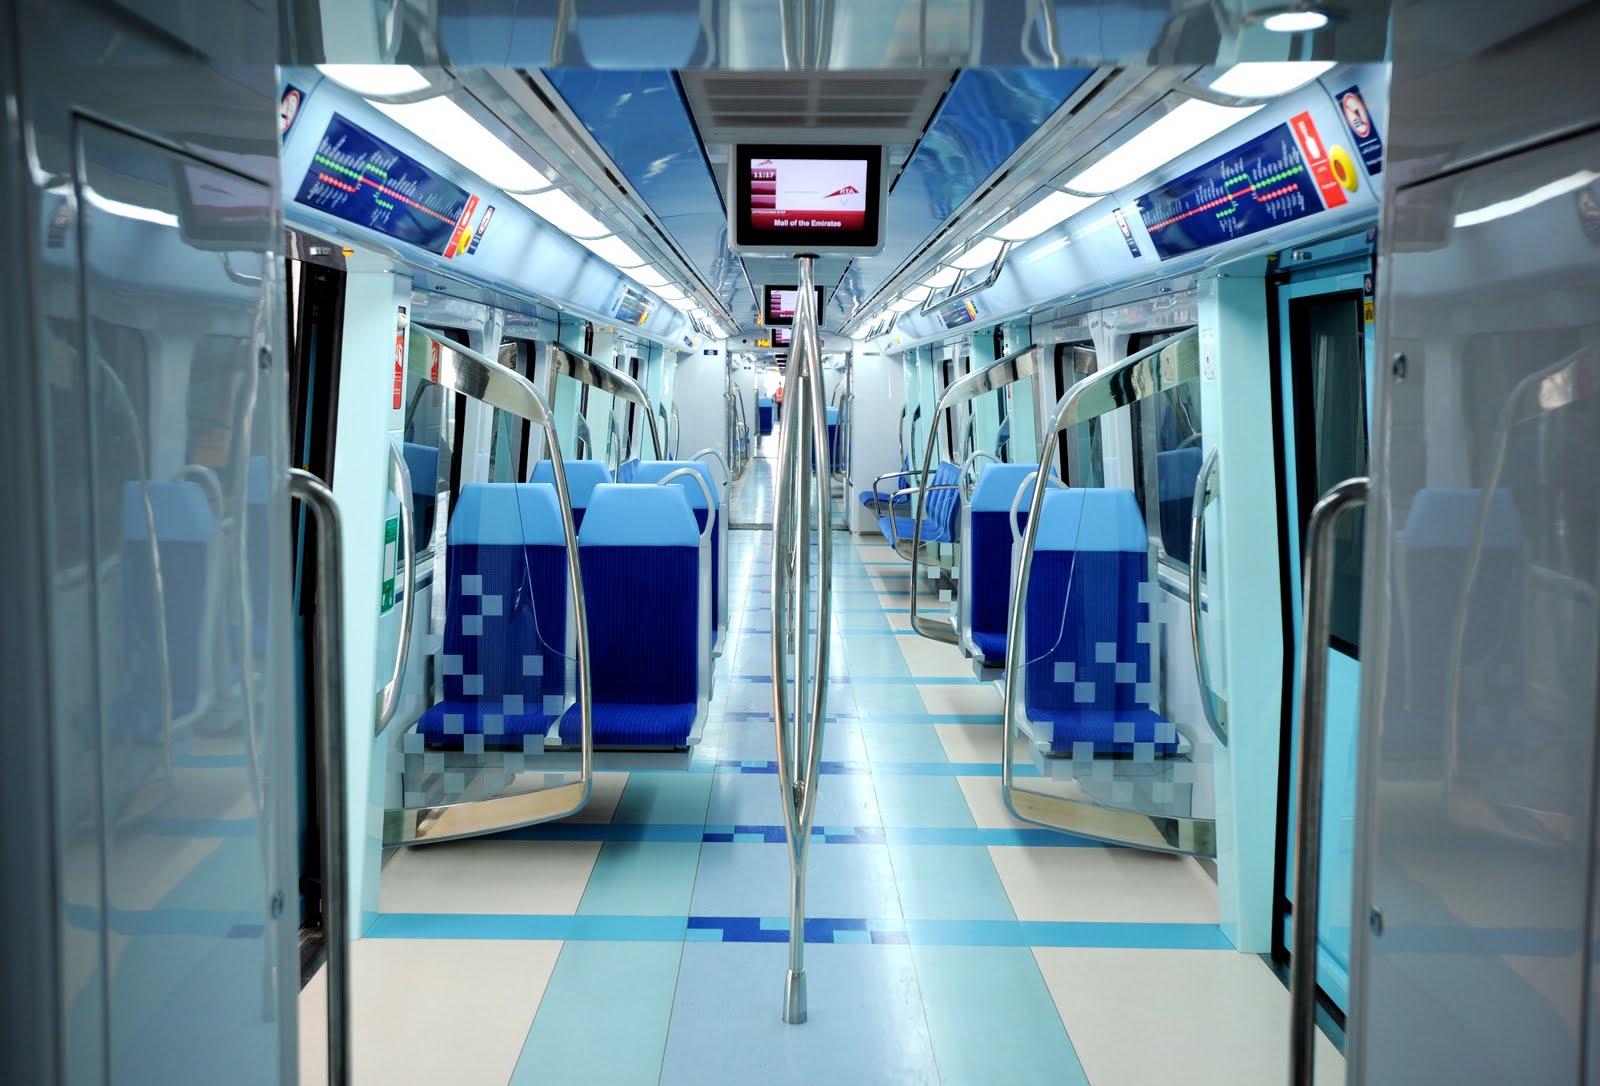 Transport w dubaju metro ycie w dubaju for Gucci hotel dubai